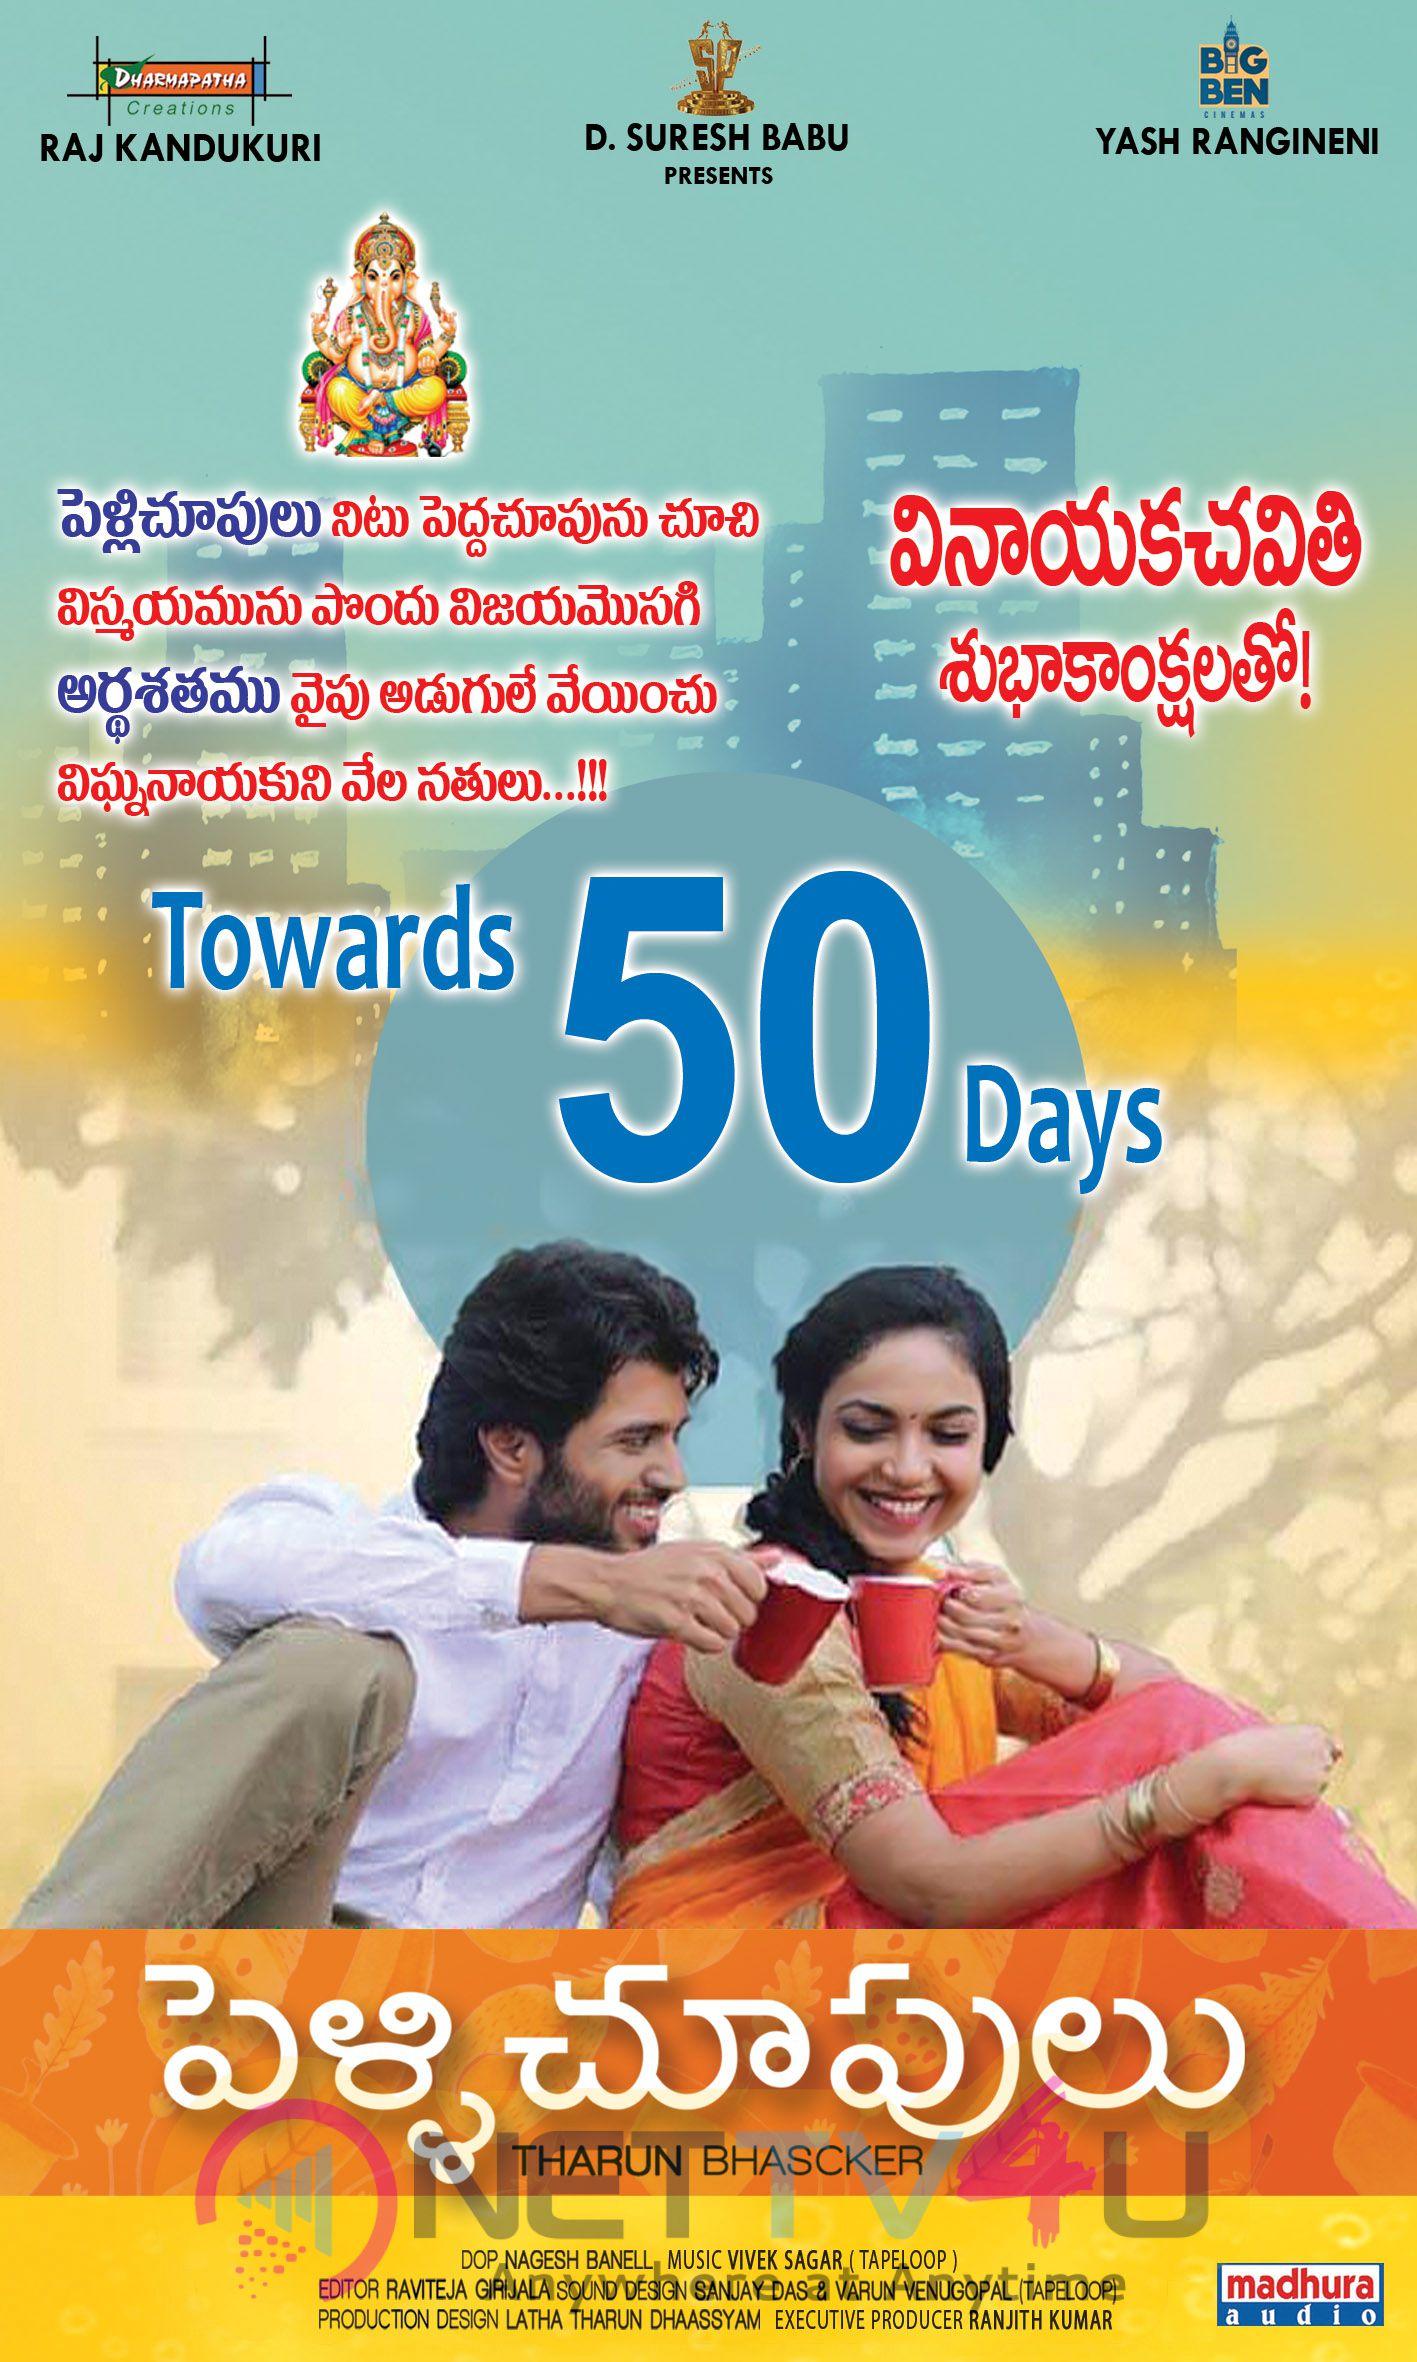 Pelli Choopulu Vinayaka Chavithi Wishes Poster Telugu Gallery